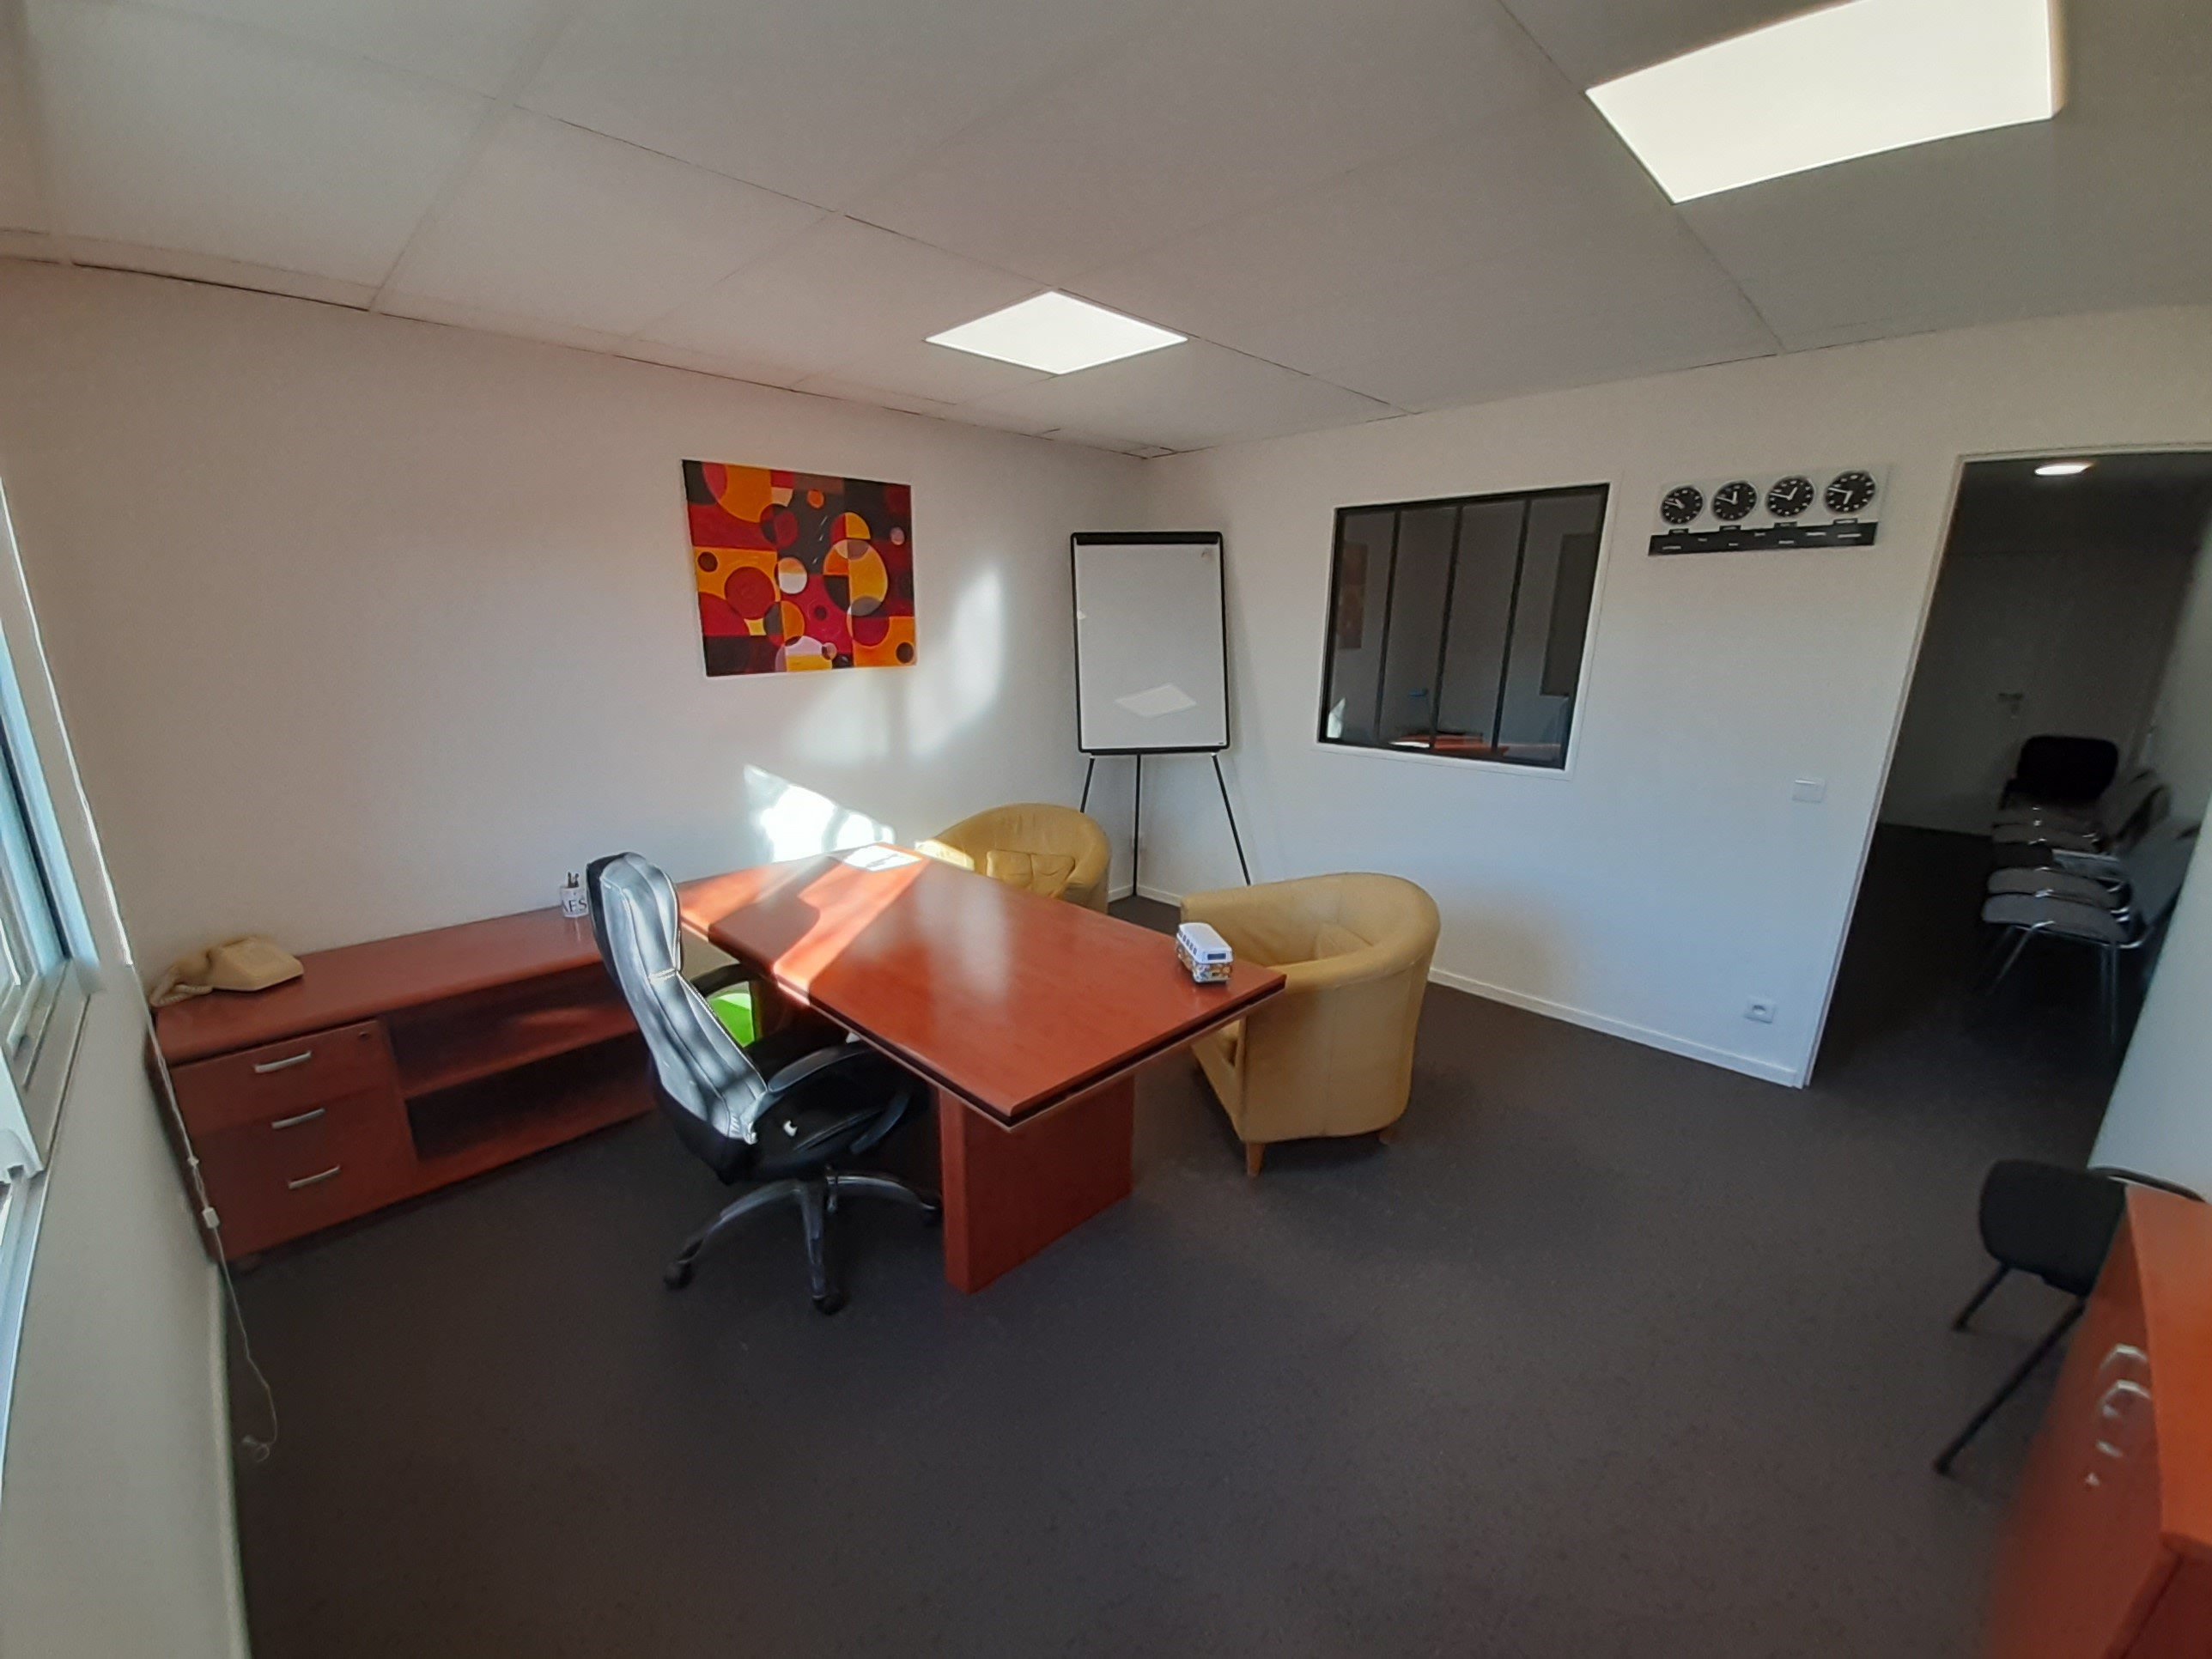 aaes 06 location de bureau salle de r union mougins. Black Bedroom Furniture Sets. Home Design Ideas